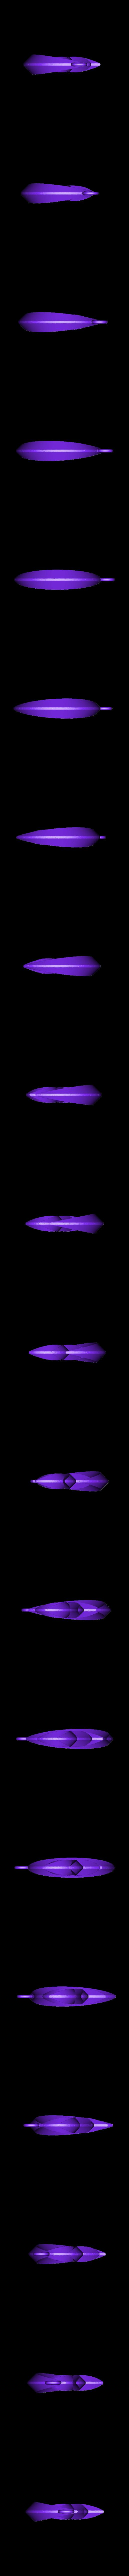 azur.stl Download free STL file Azura's star • 3D printable model, shuranikishin